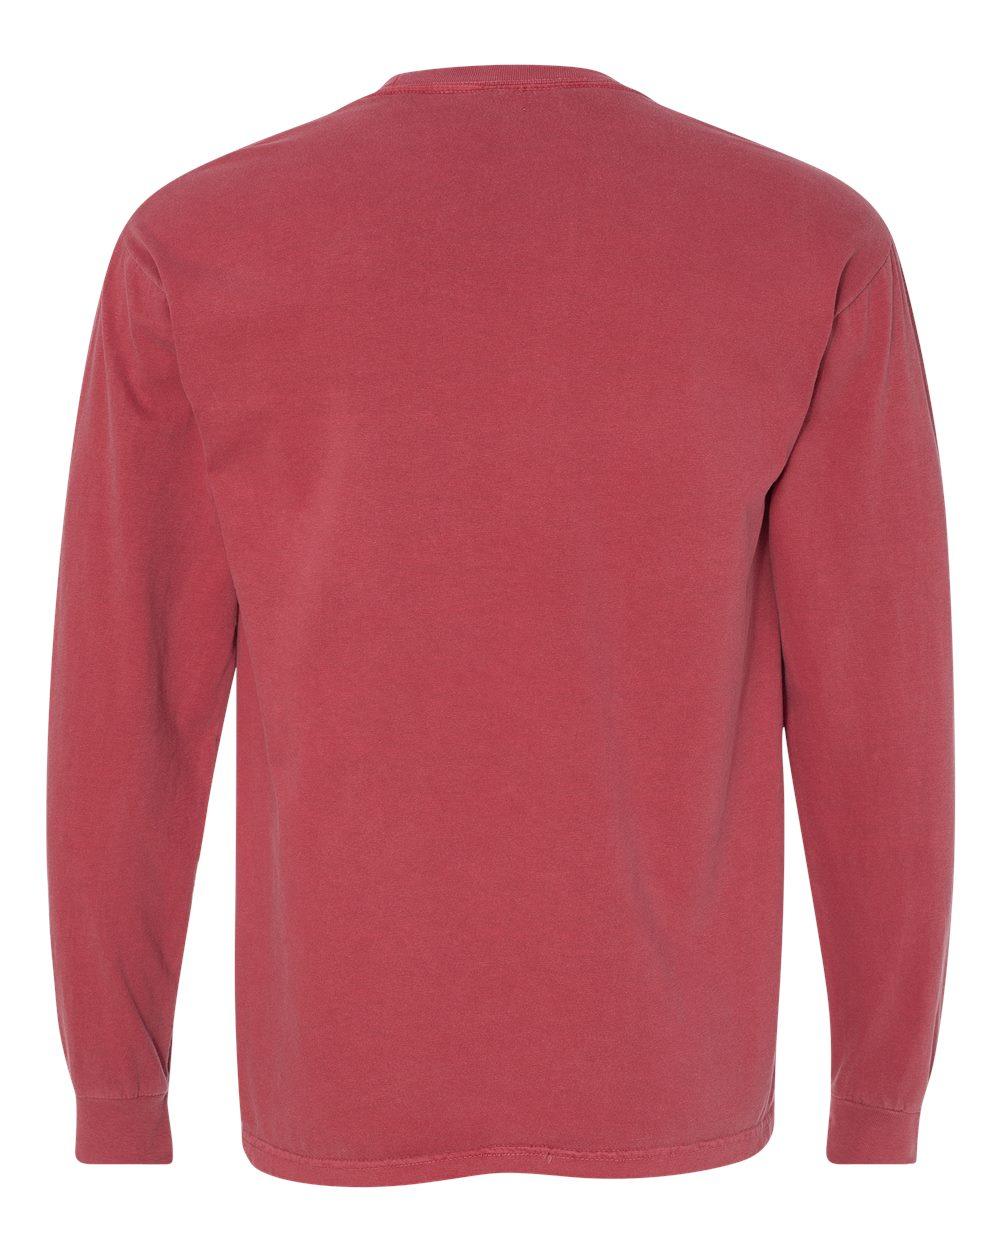 Comfort-Colors-Men-039-s-6-1-oz-Long-Sleeve-Pocket-T-Shirt-C4410-S-3XL thumbnail 12